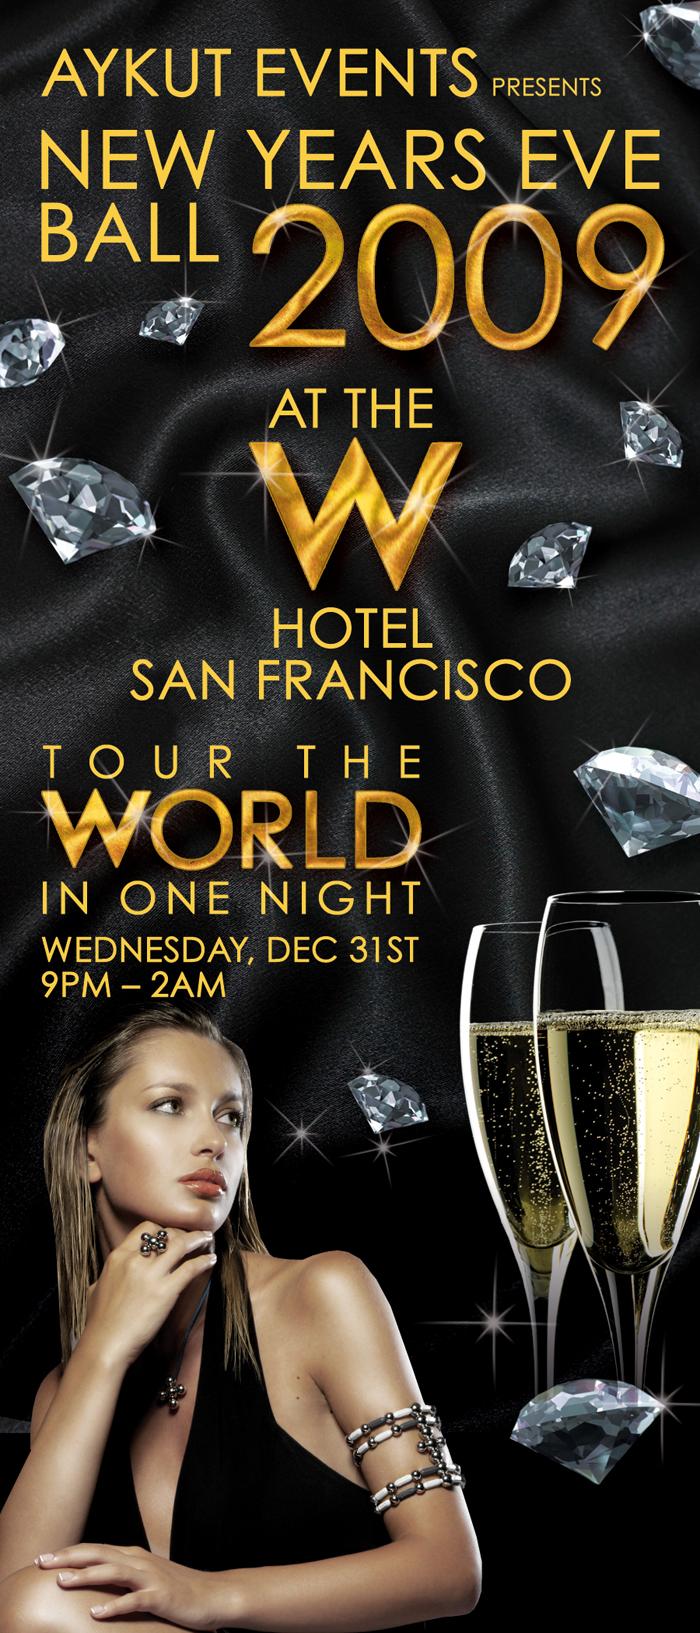 NYE 2009 AT THE W HOTEL